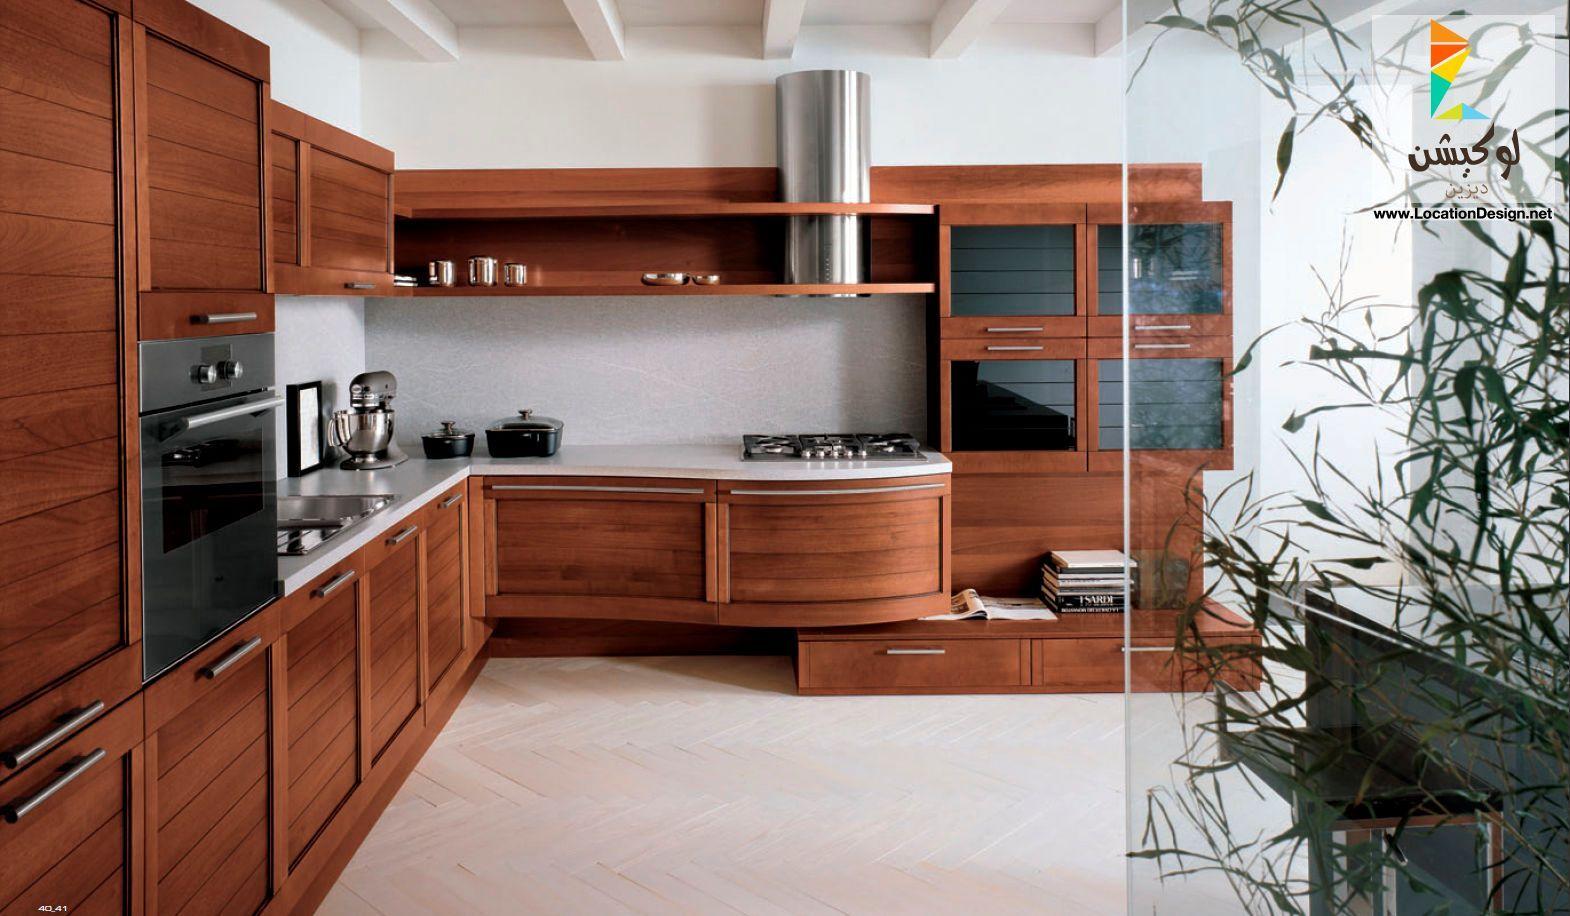 احدث كتالوج صور مطابخ خشب وام دى اف و اكليريك مودرن 2017 2018 Modern Wooden Kitchen Kitchen Design Contemporary Kitchen Design